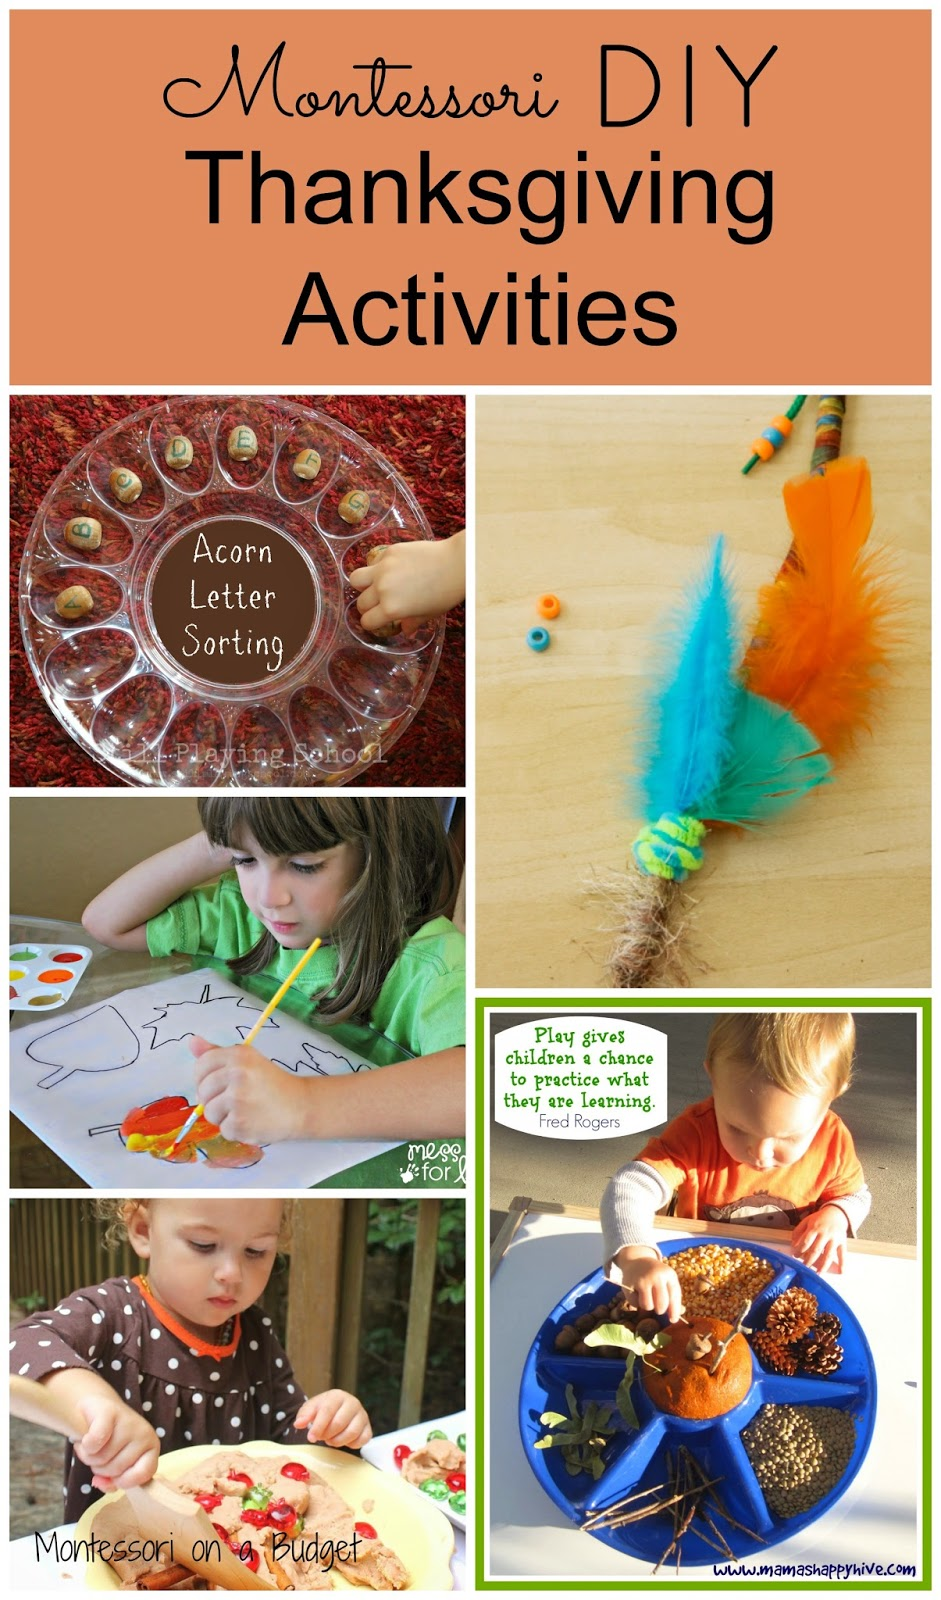 Montessori diy thanksgiving activities